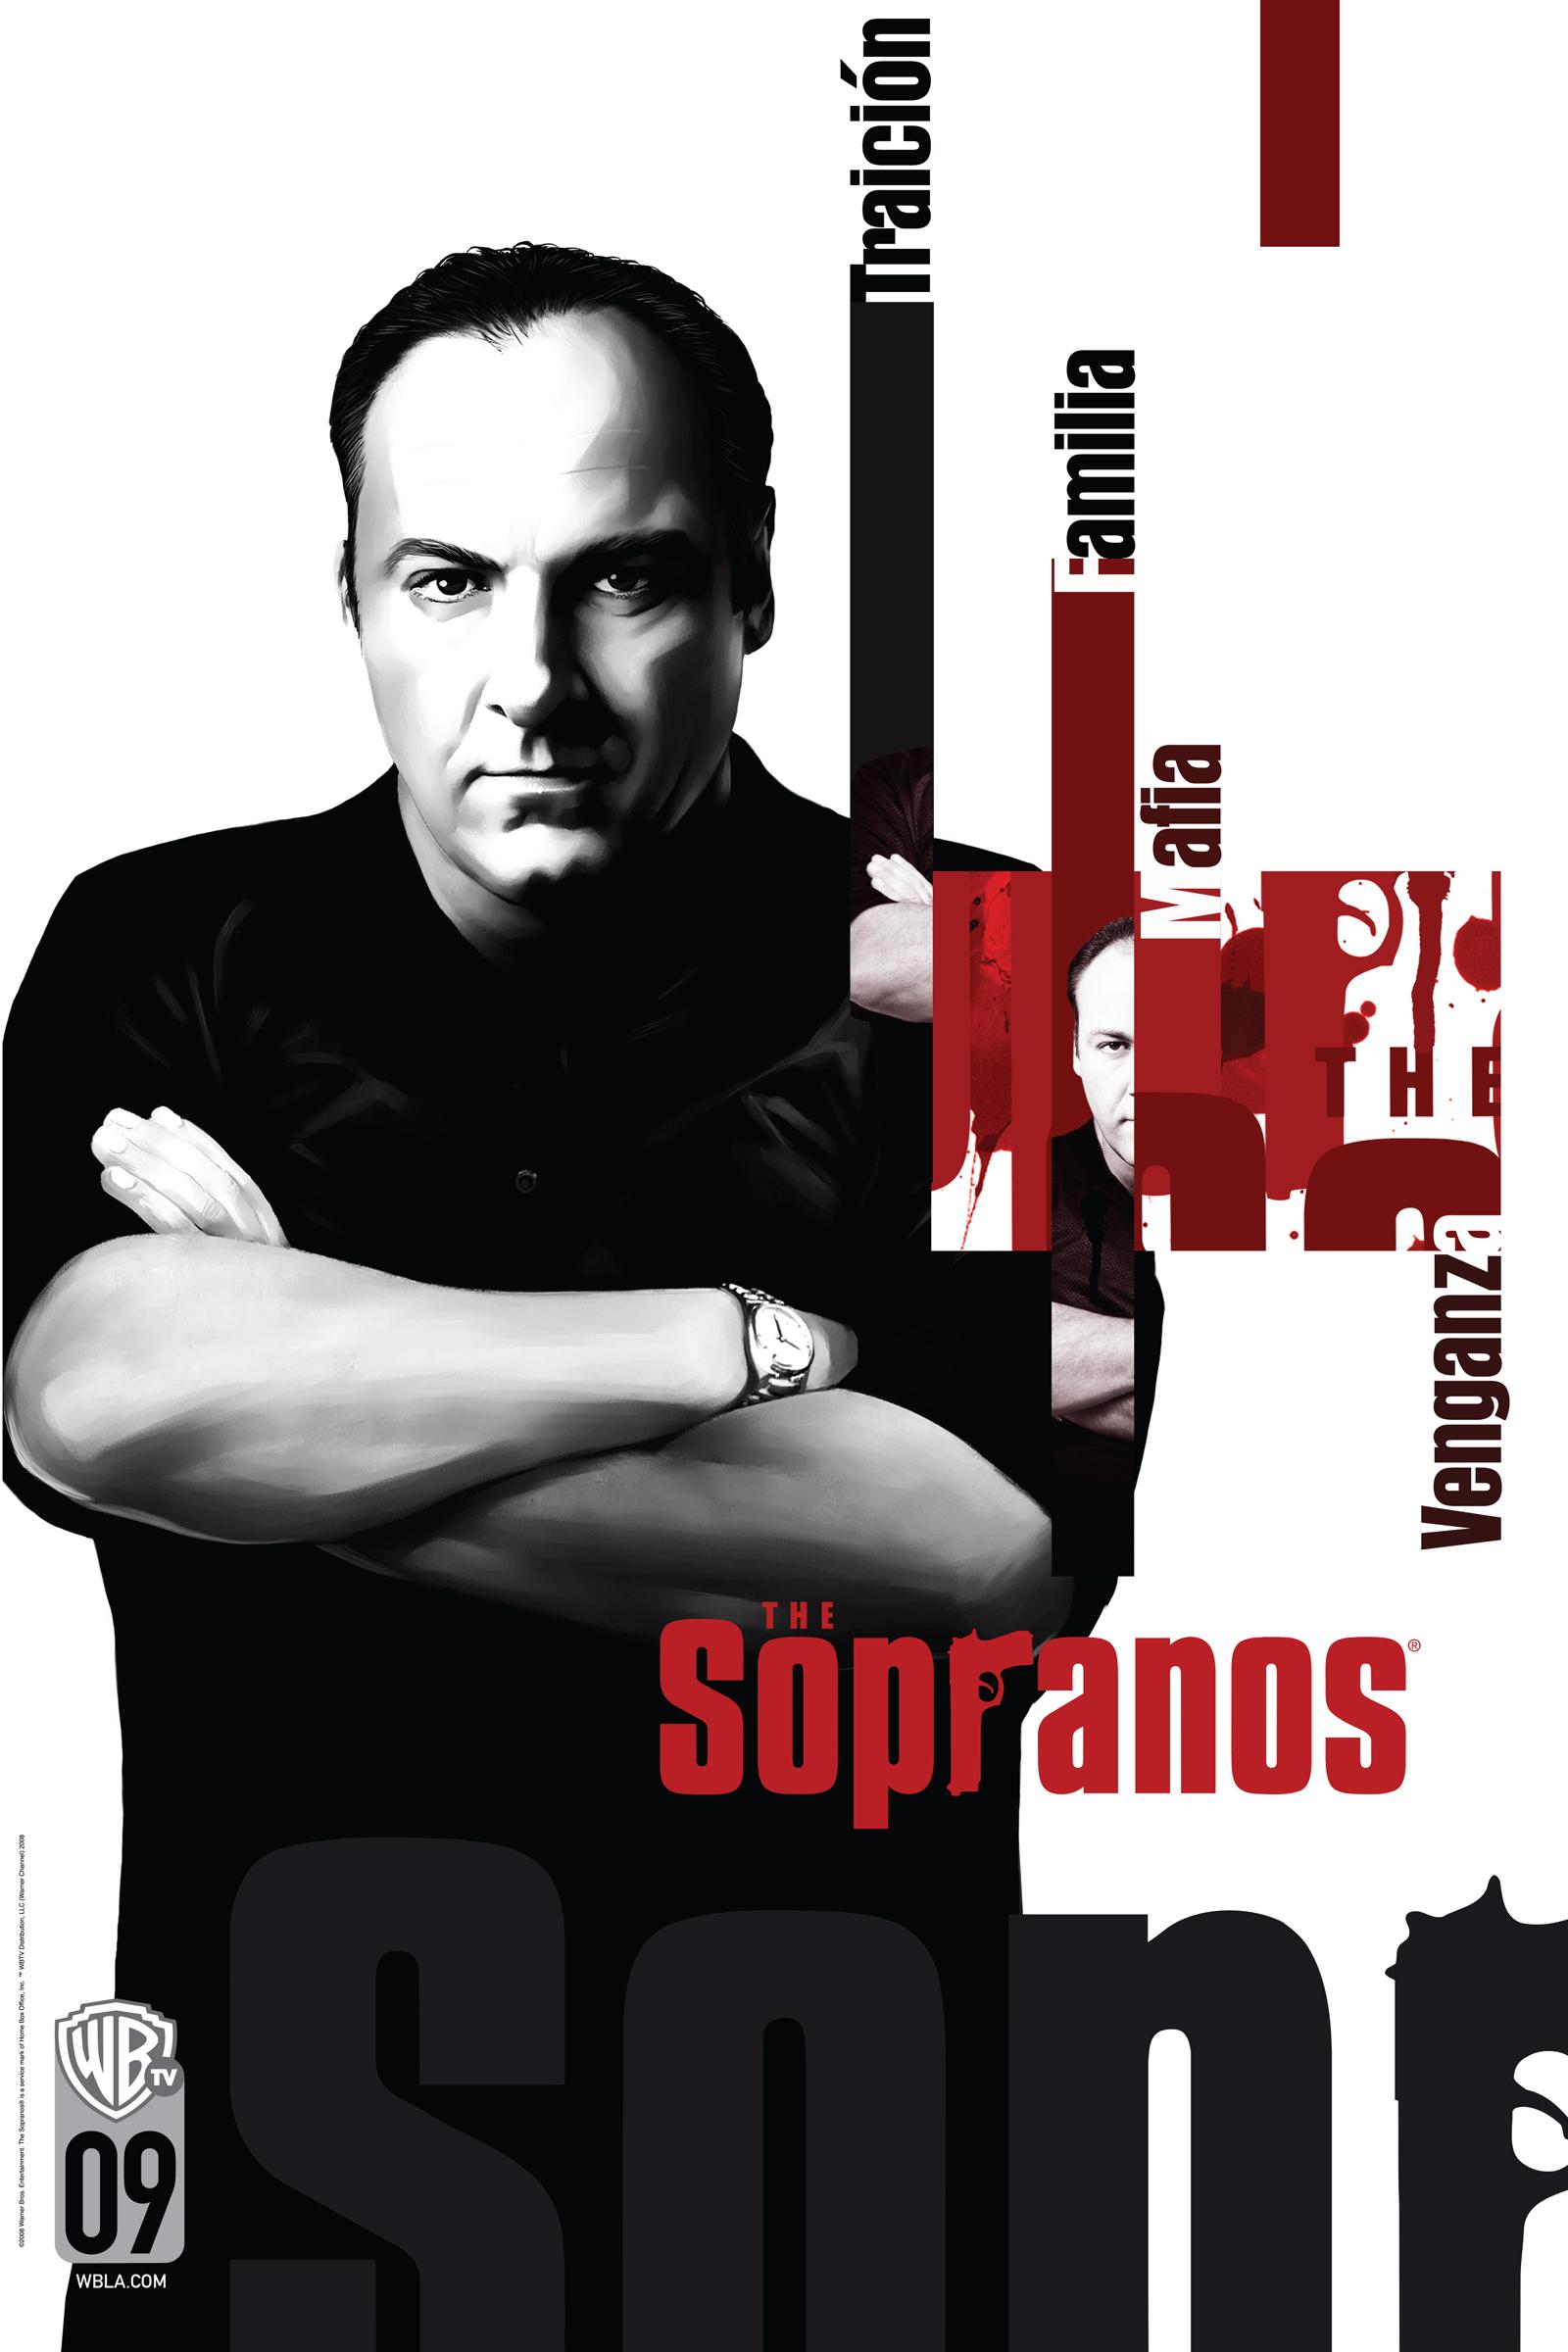 Poster_12.3x18.5.jpg